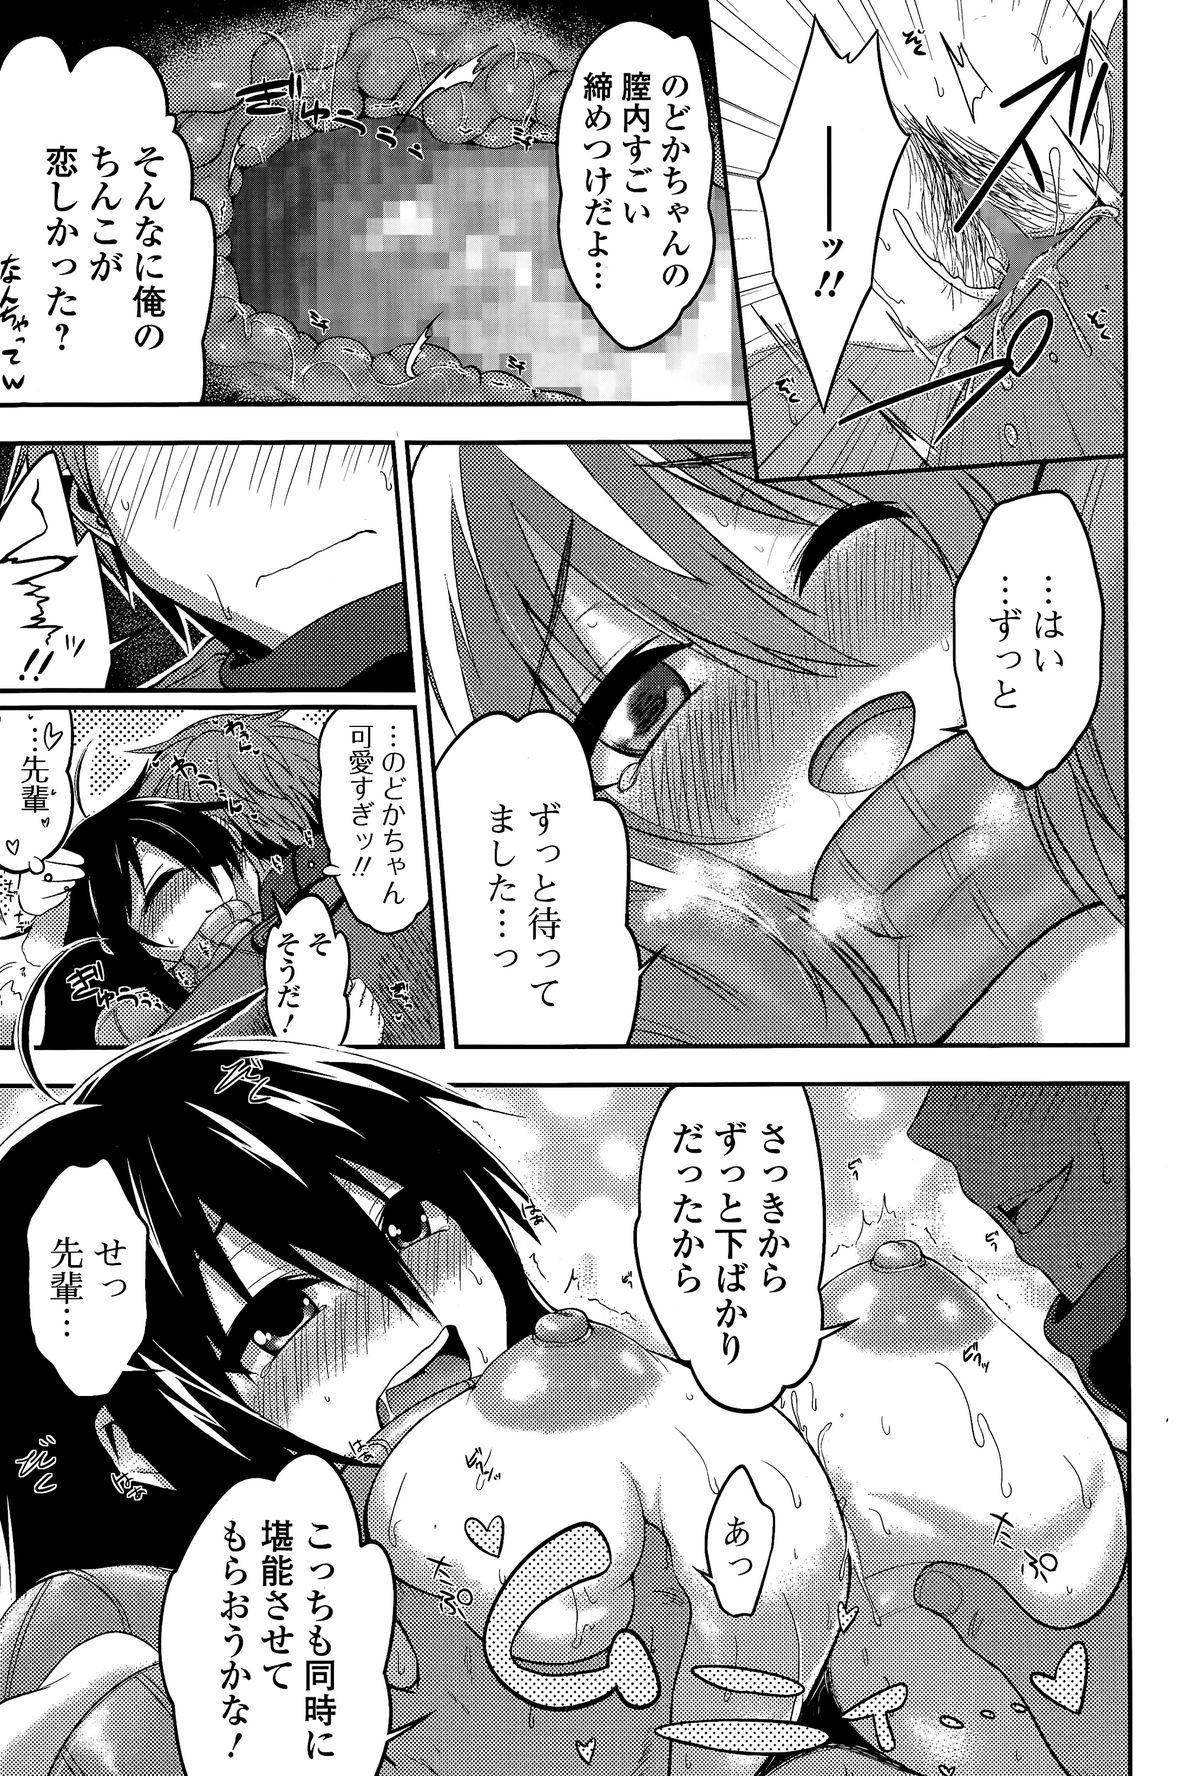 Comic Toutetsu 2015-02 Vol. 3 74